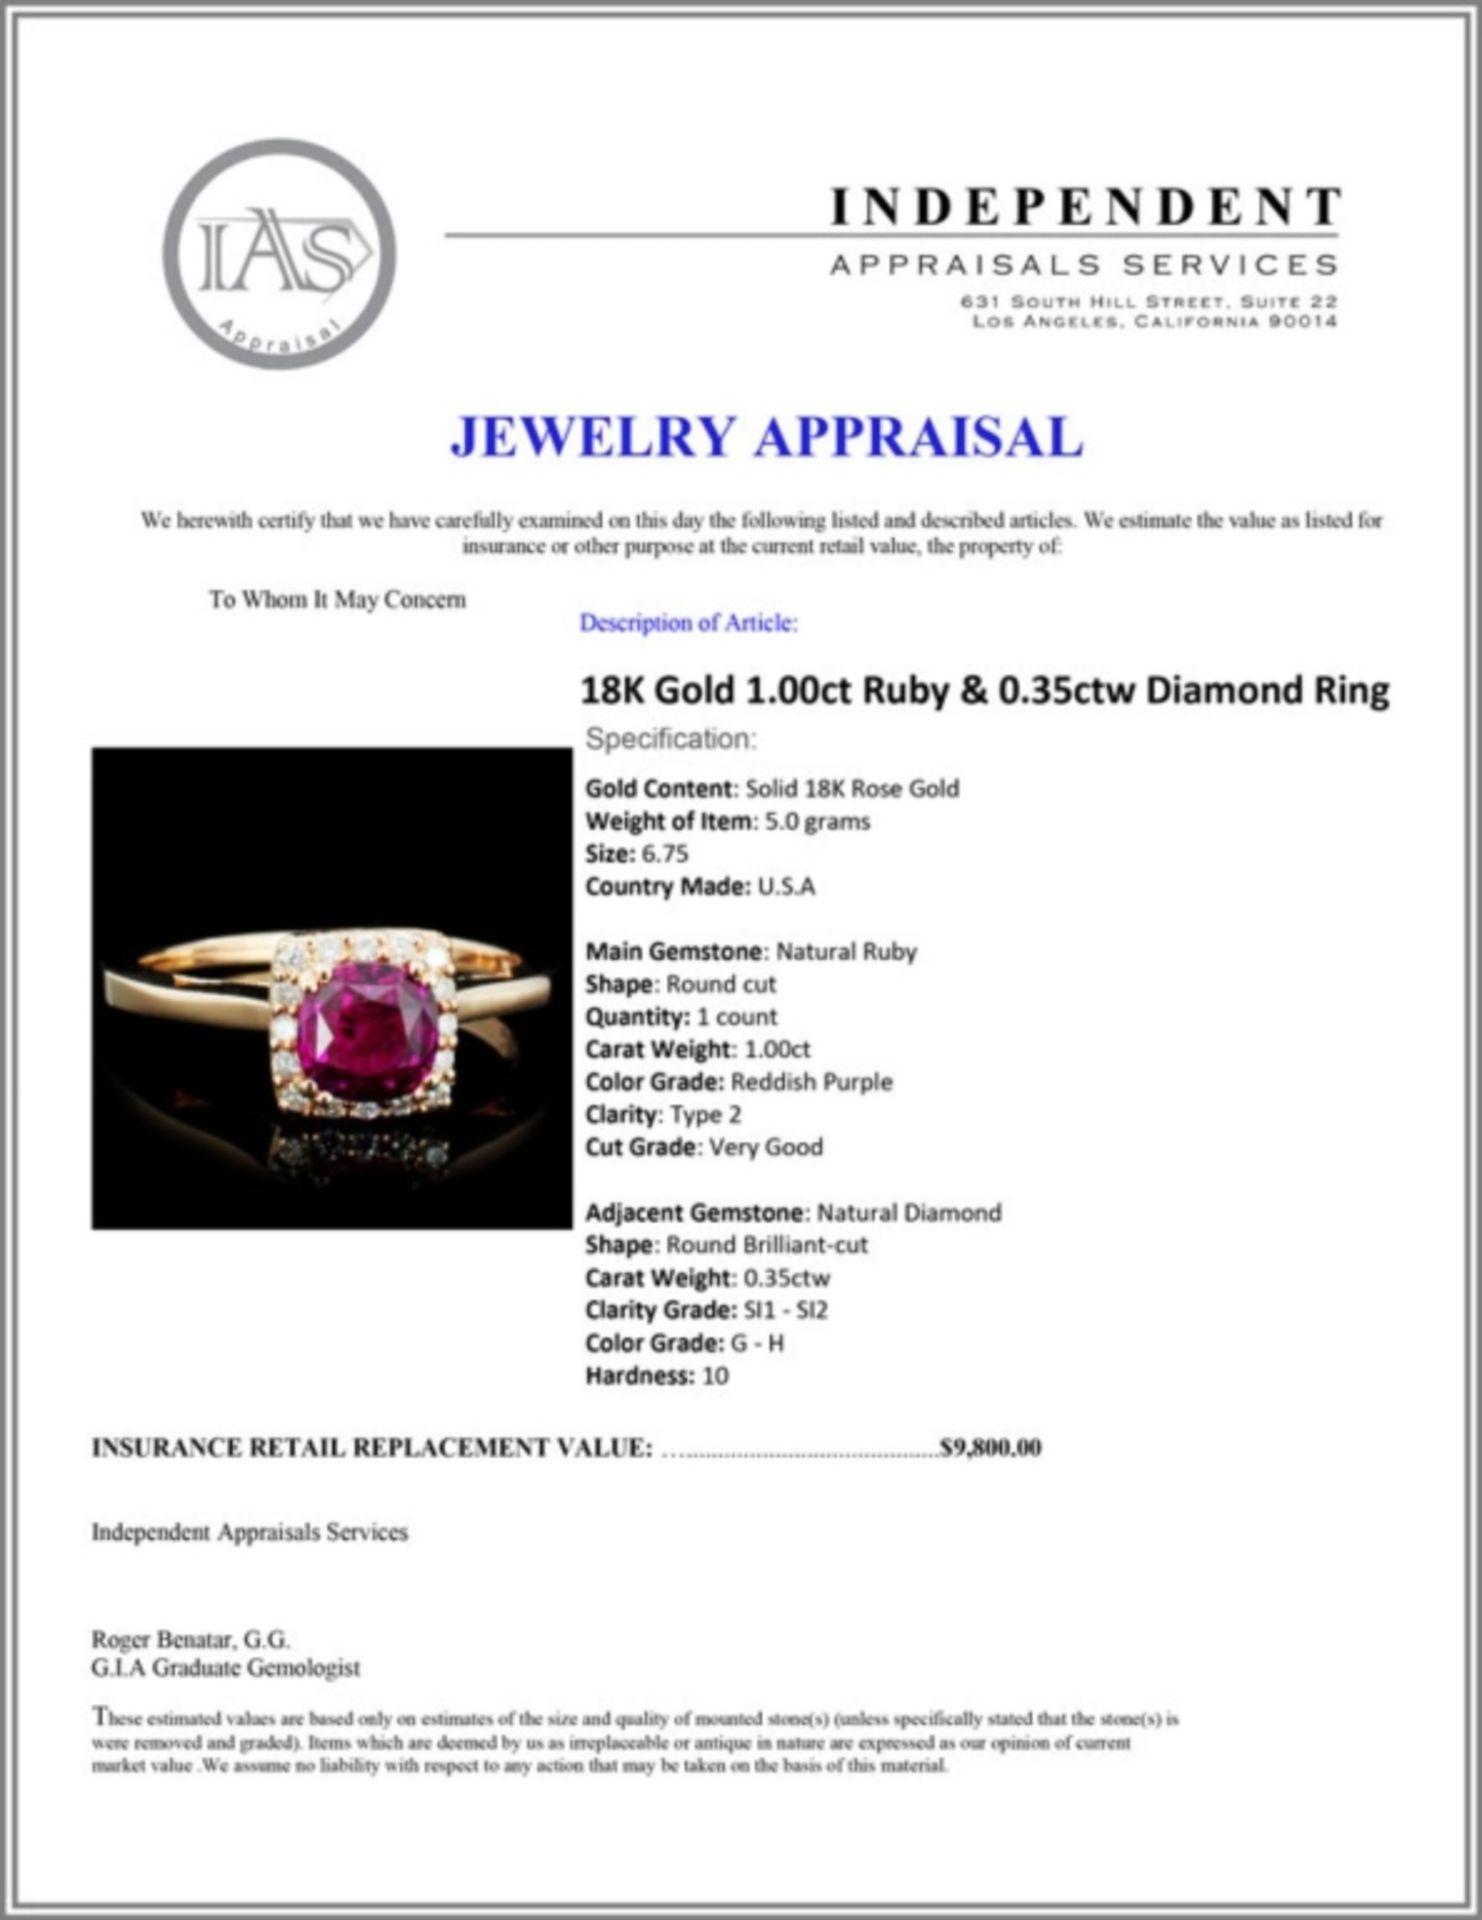 18K Gold 1.00ct Ruby & 0.35ctw Diamond Ring - Image 3 of 3